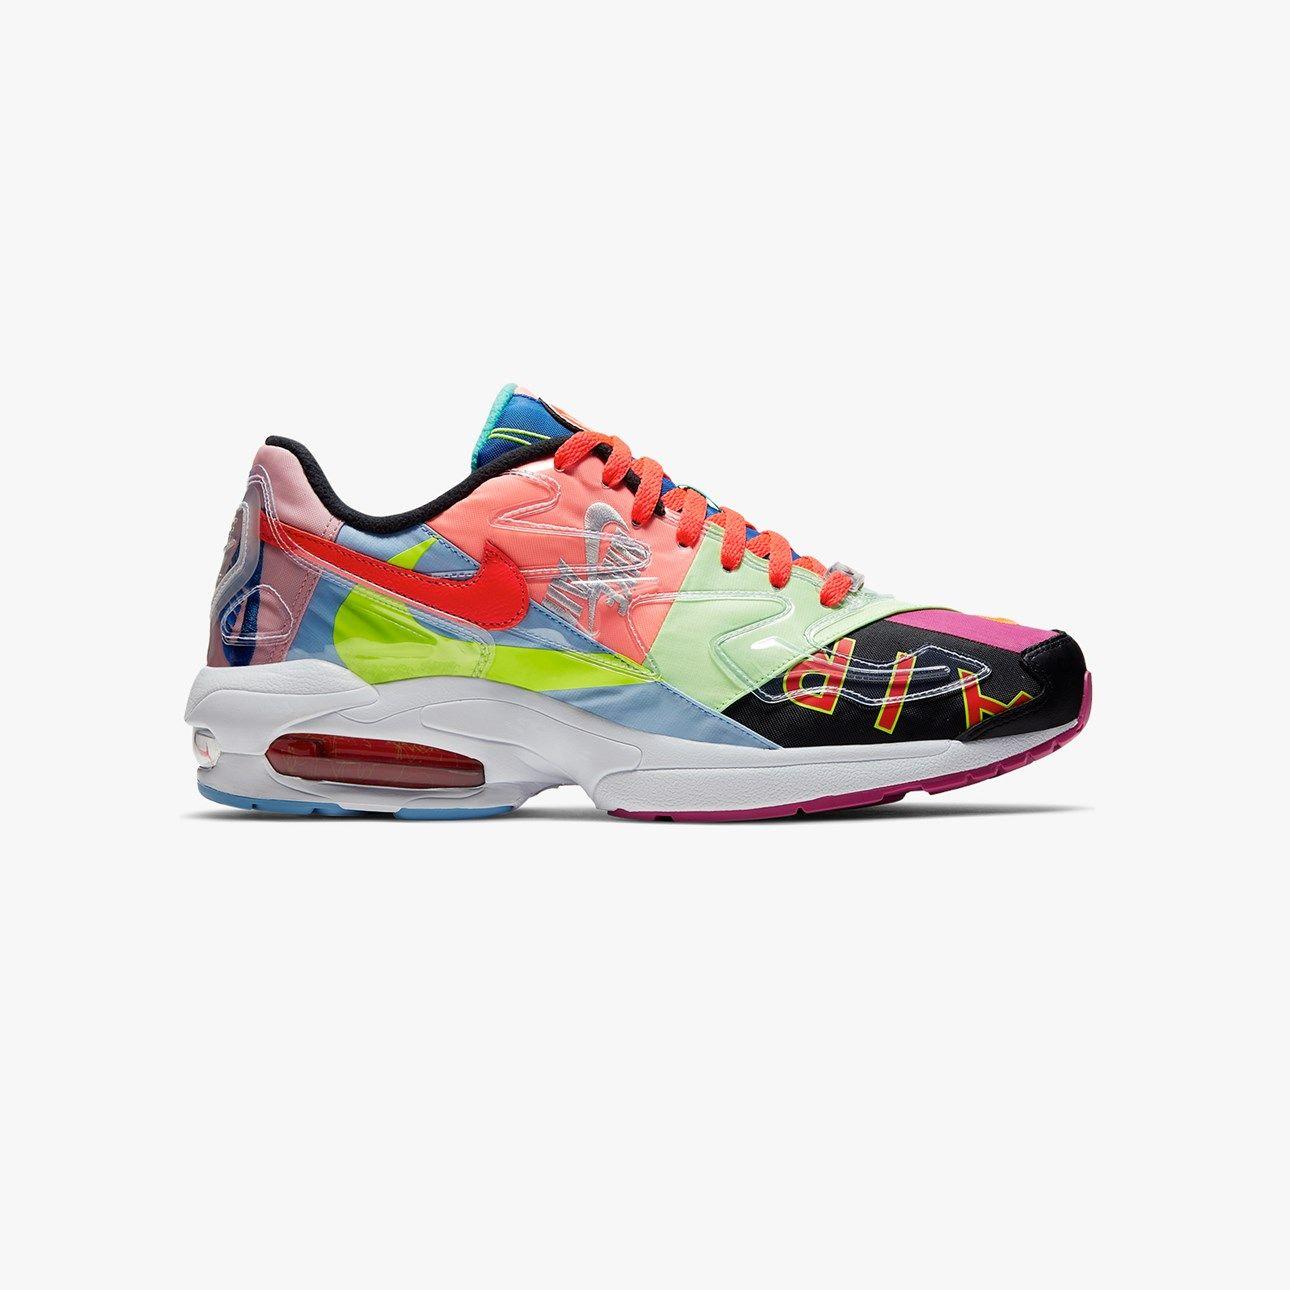 66d9927f Nike Air Max2 Light QS x Atmos - Bv7406-001 - Sneakersnstuff   sneakers & streetwear  online since 1999